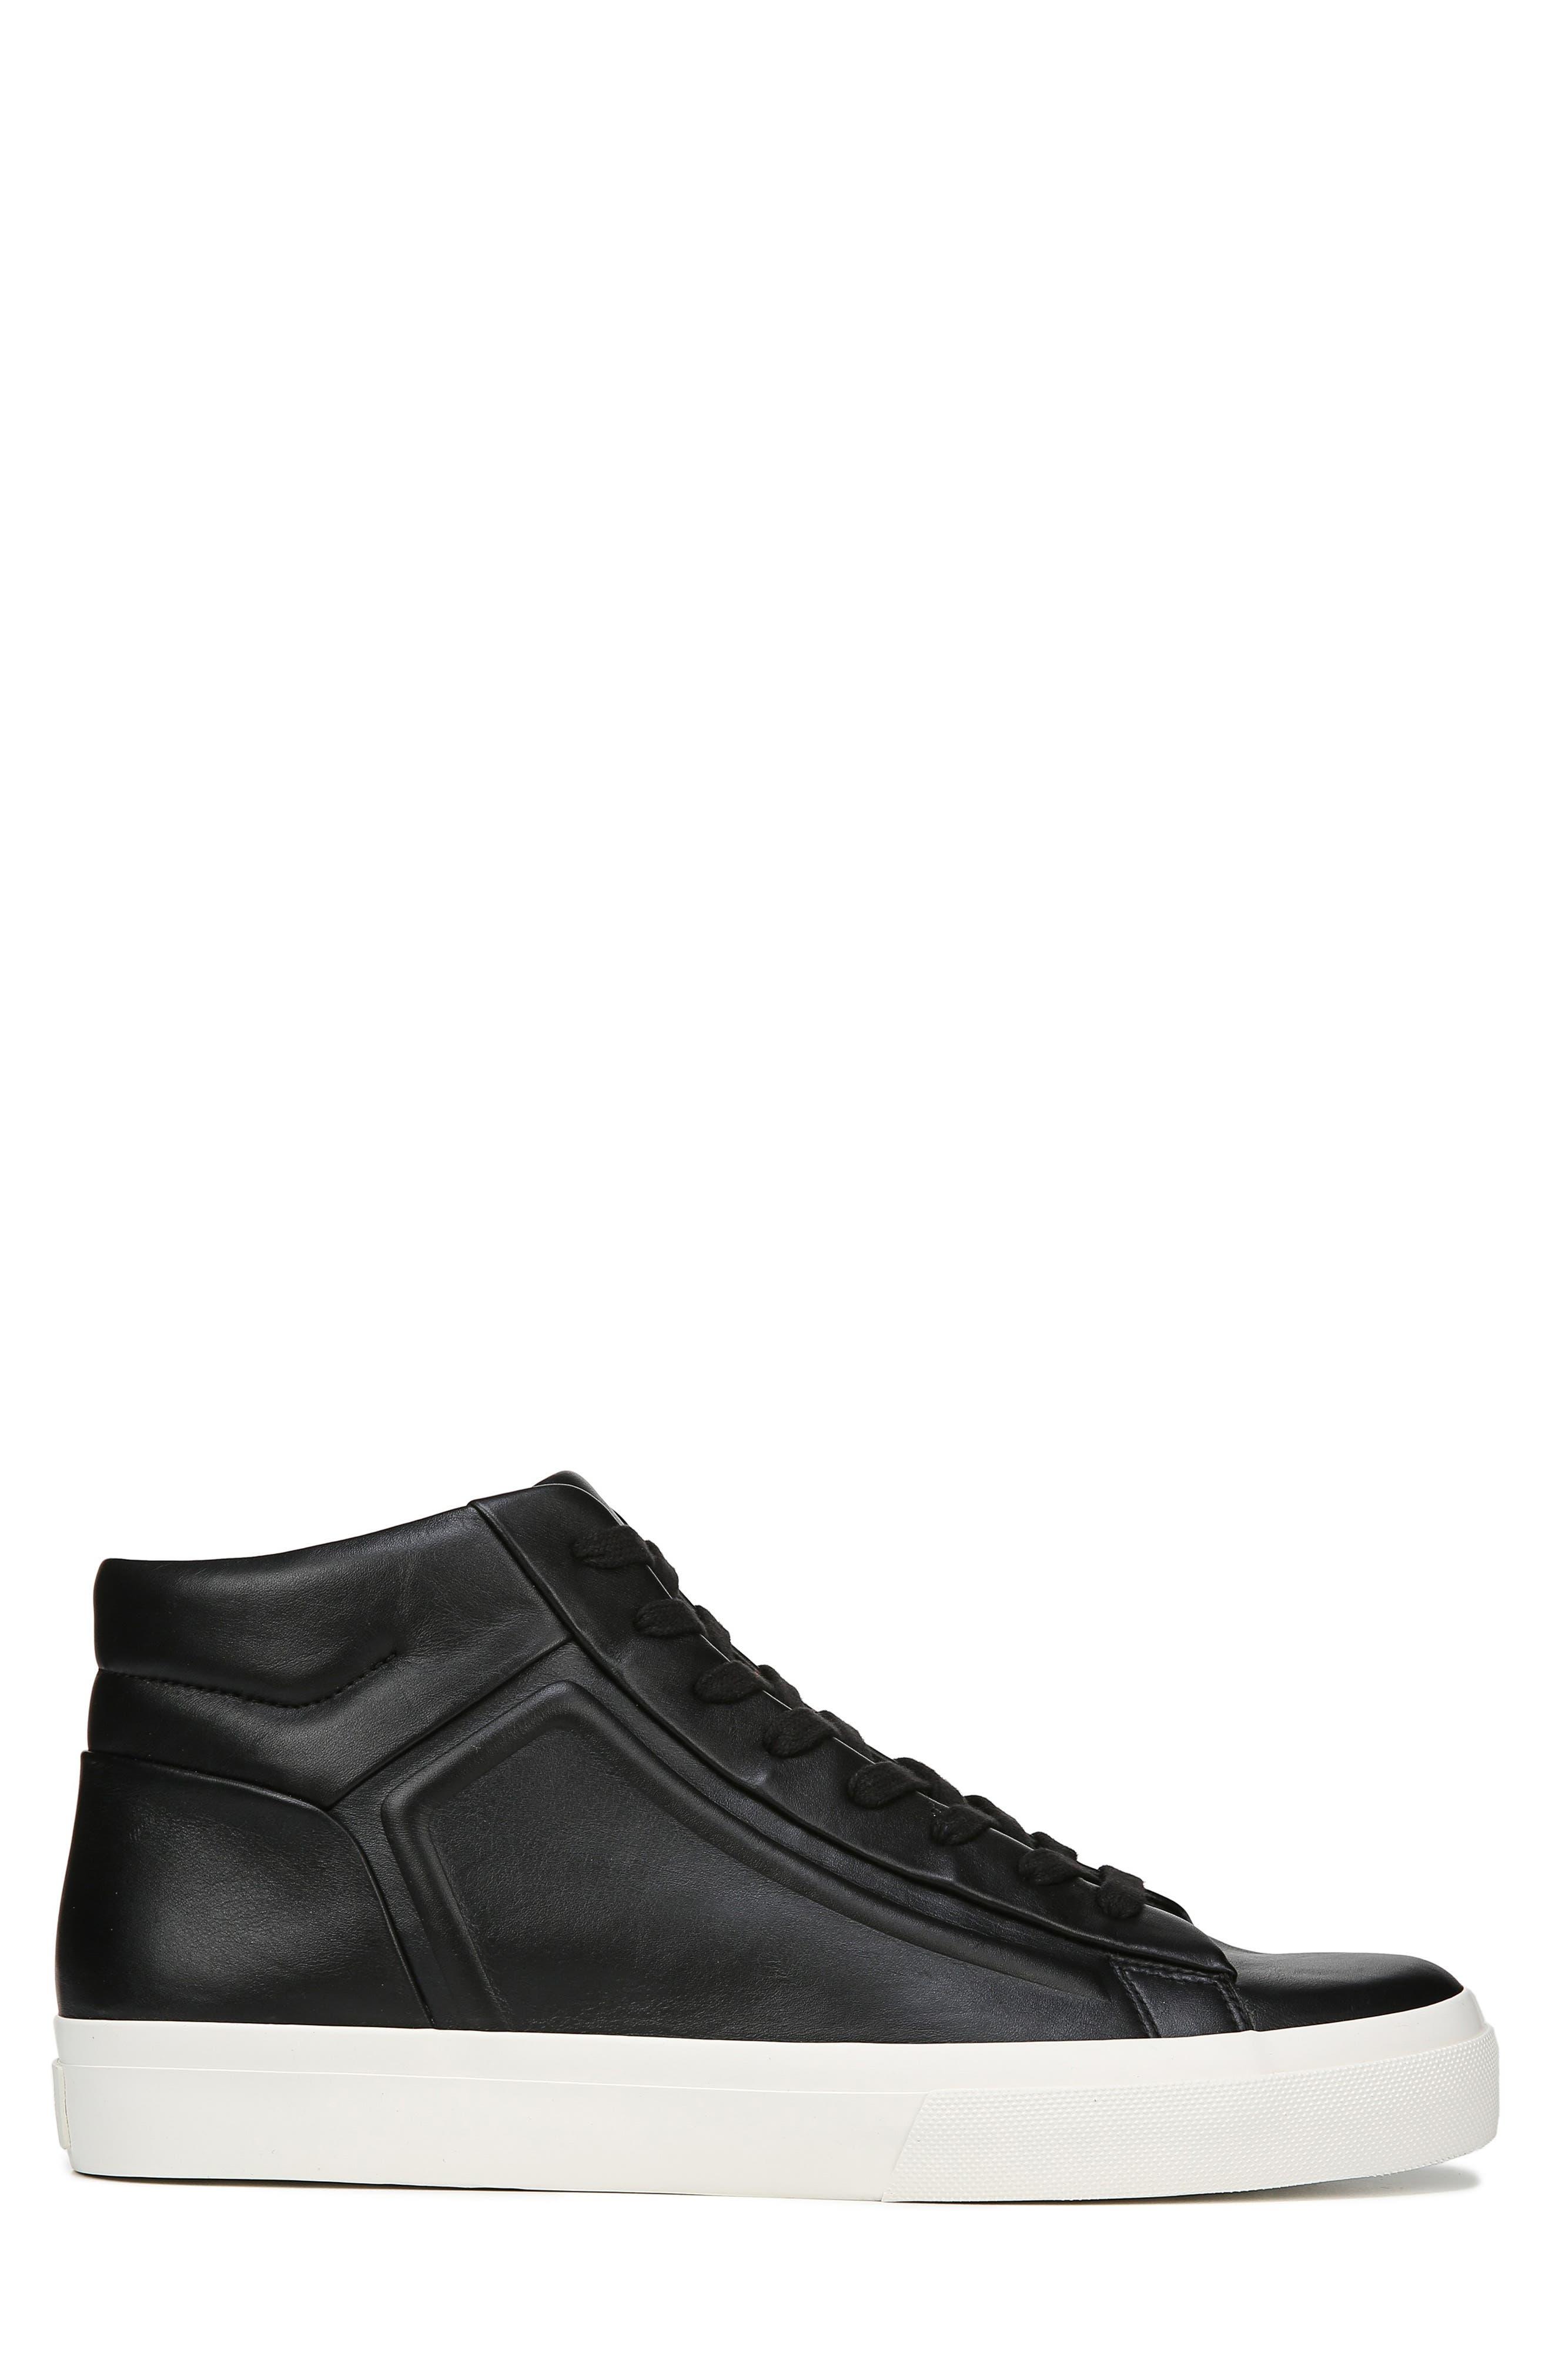 VINCE, Fynn High Top Sneaker, Alternate thumbnail 3, color, BLACK